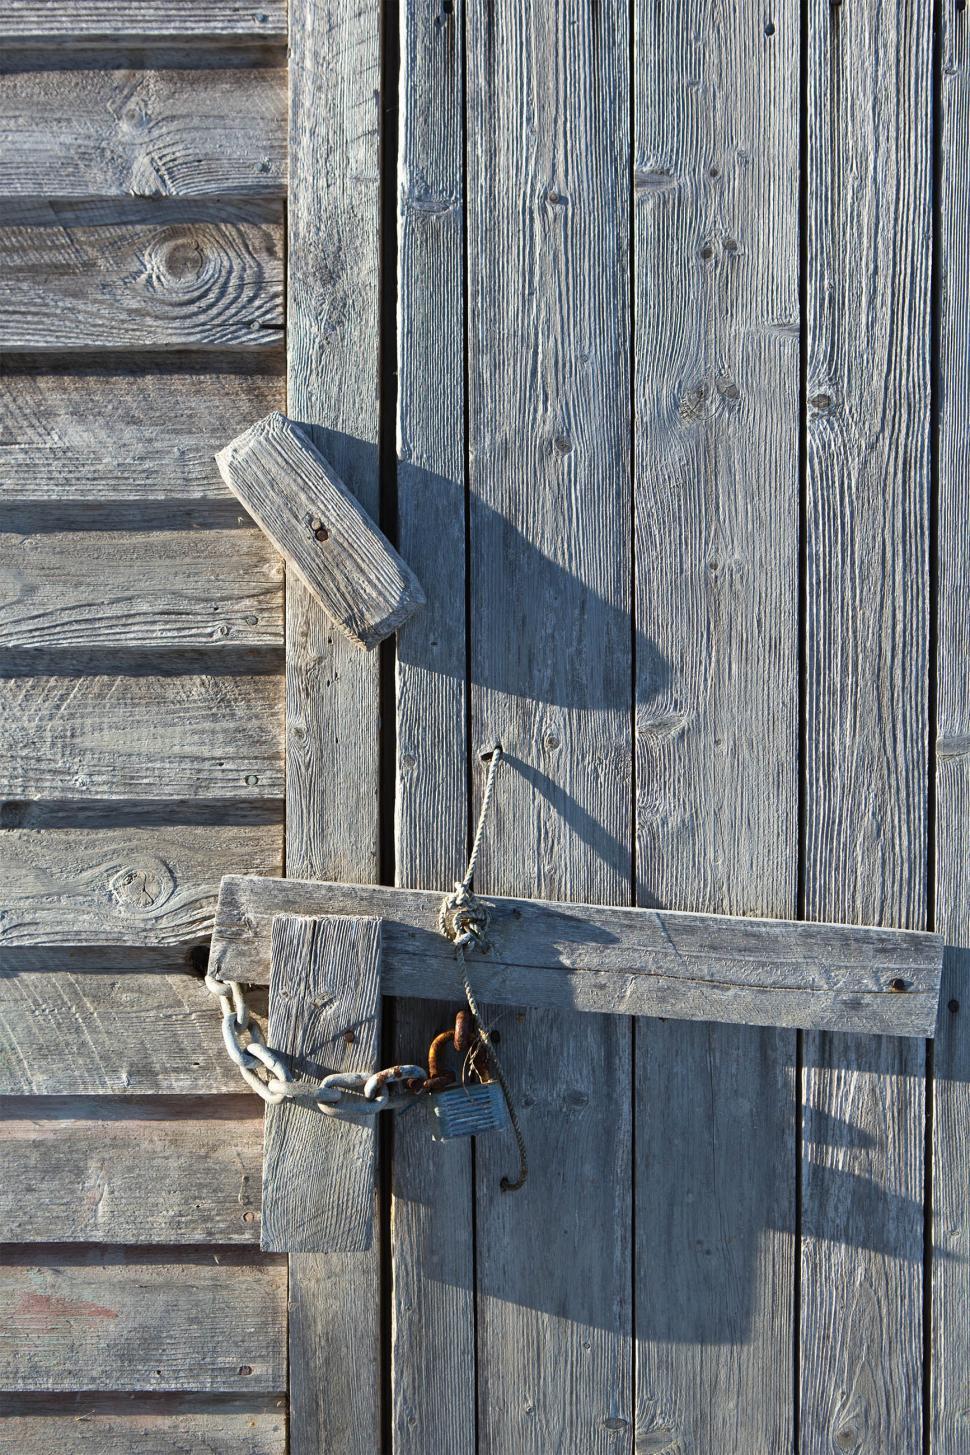 Download Free Stock Photo of Latch on Door